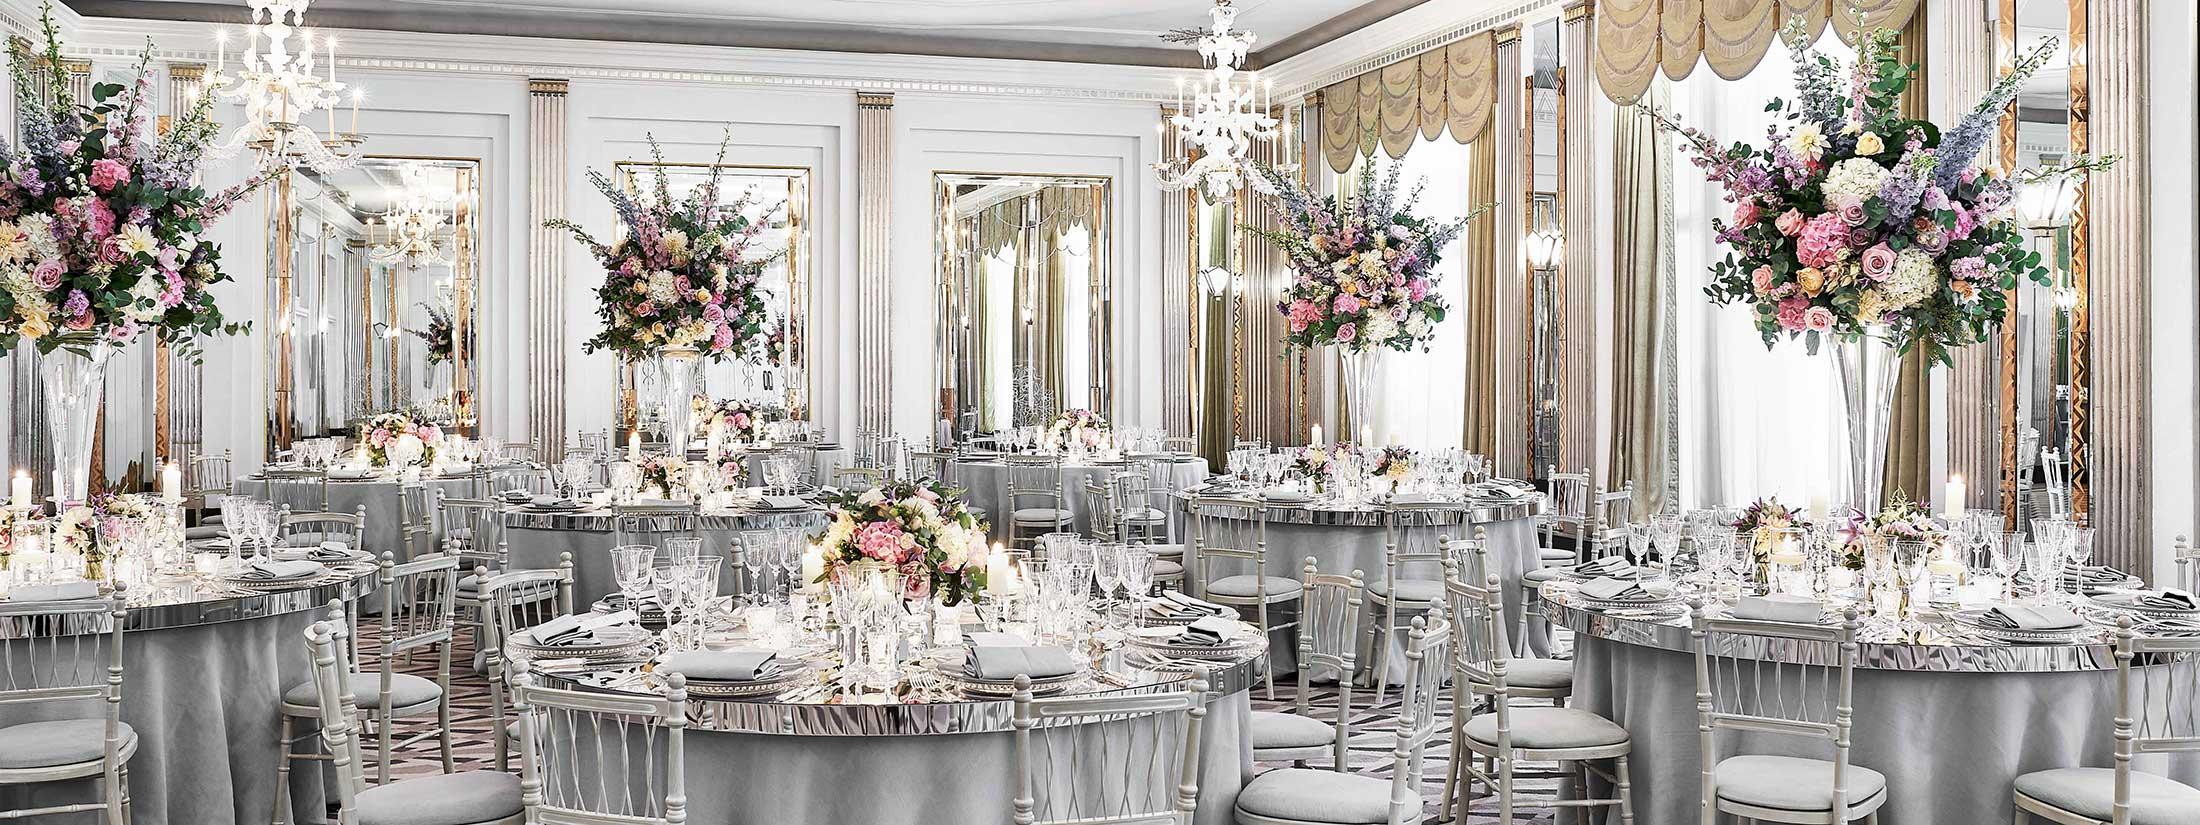 Wedding in the ballroom at Claridge's